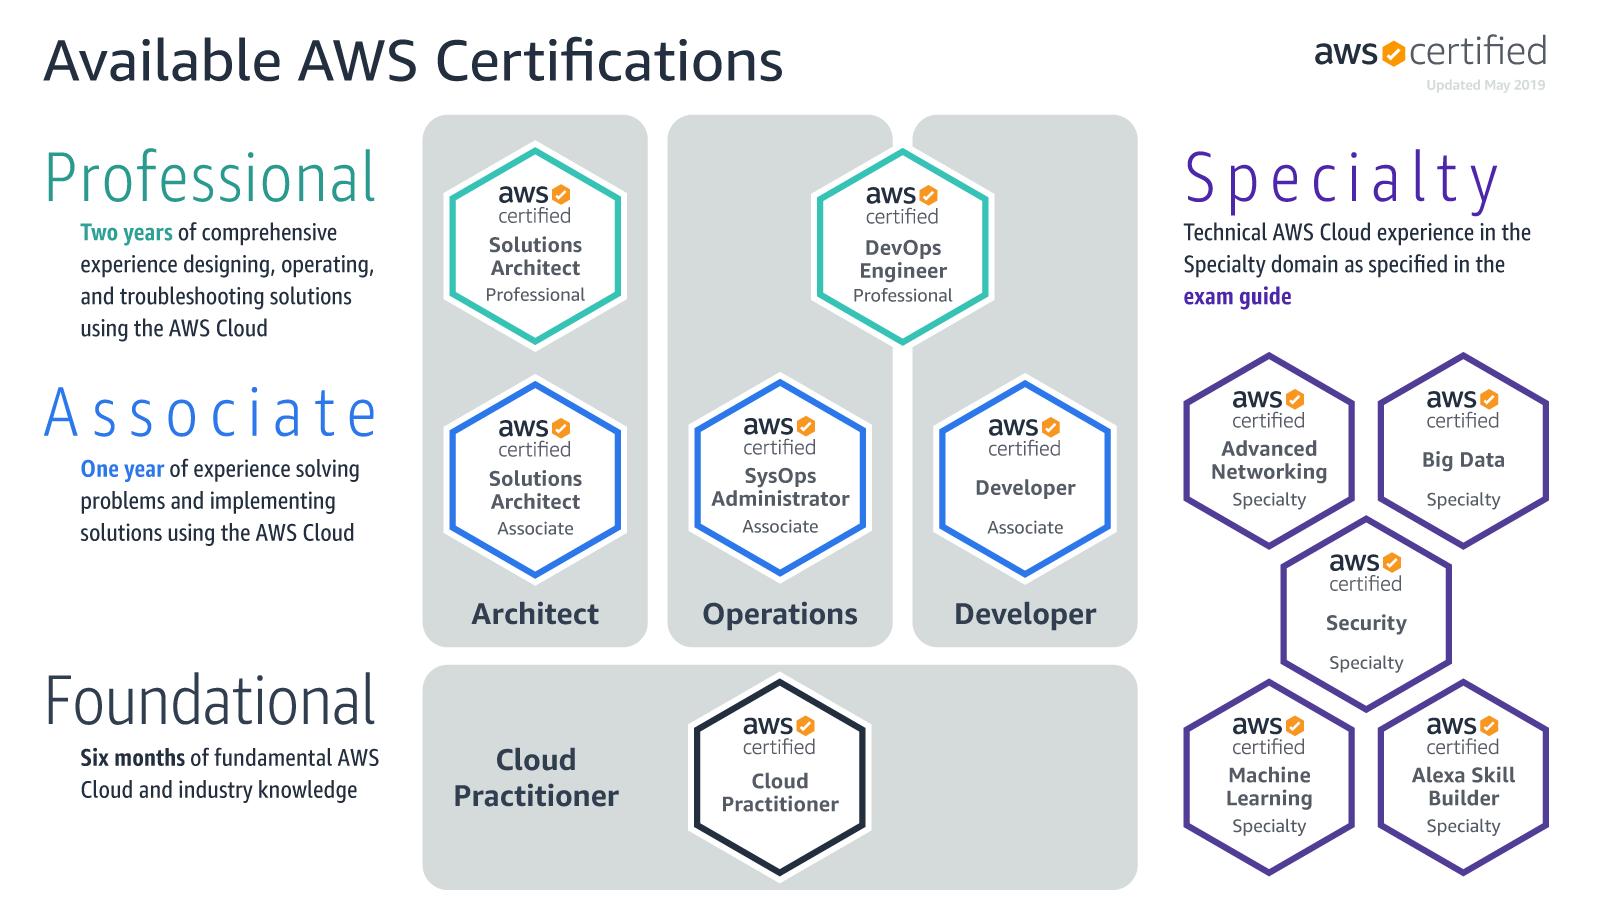 Amazon Web Services – ARCH – Architecting on AWS